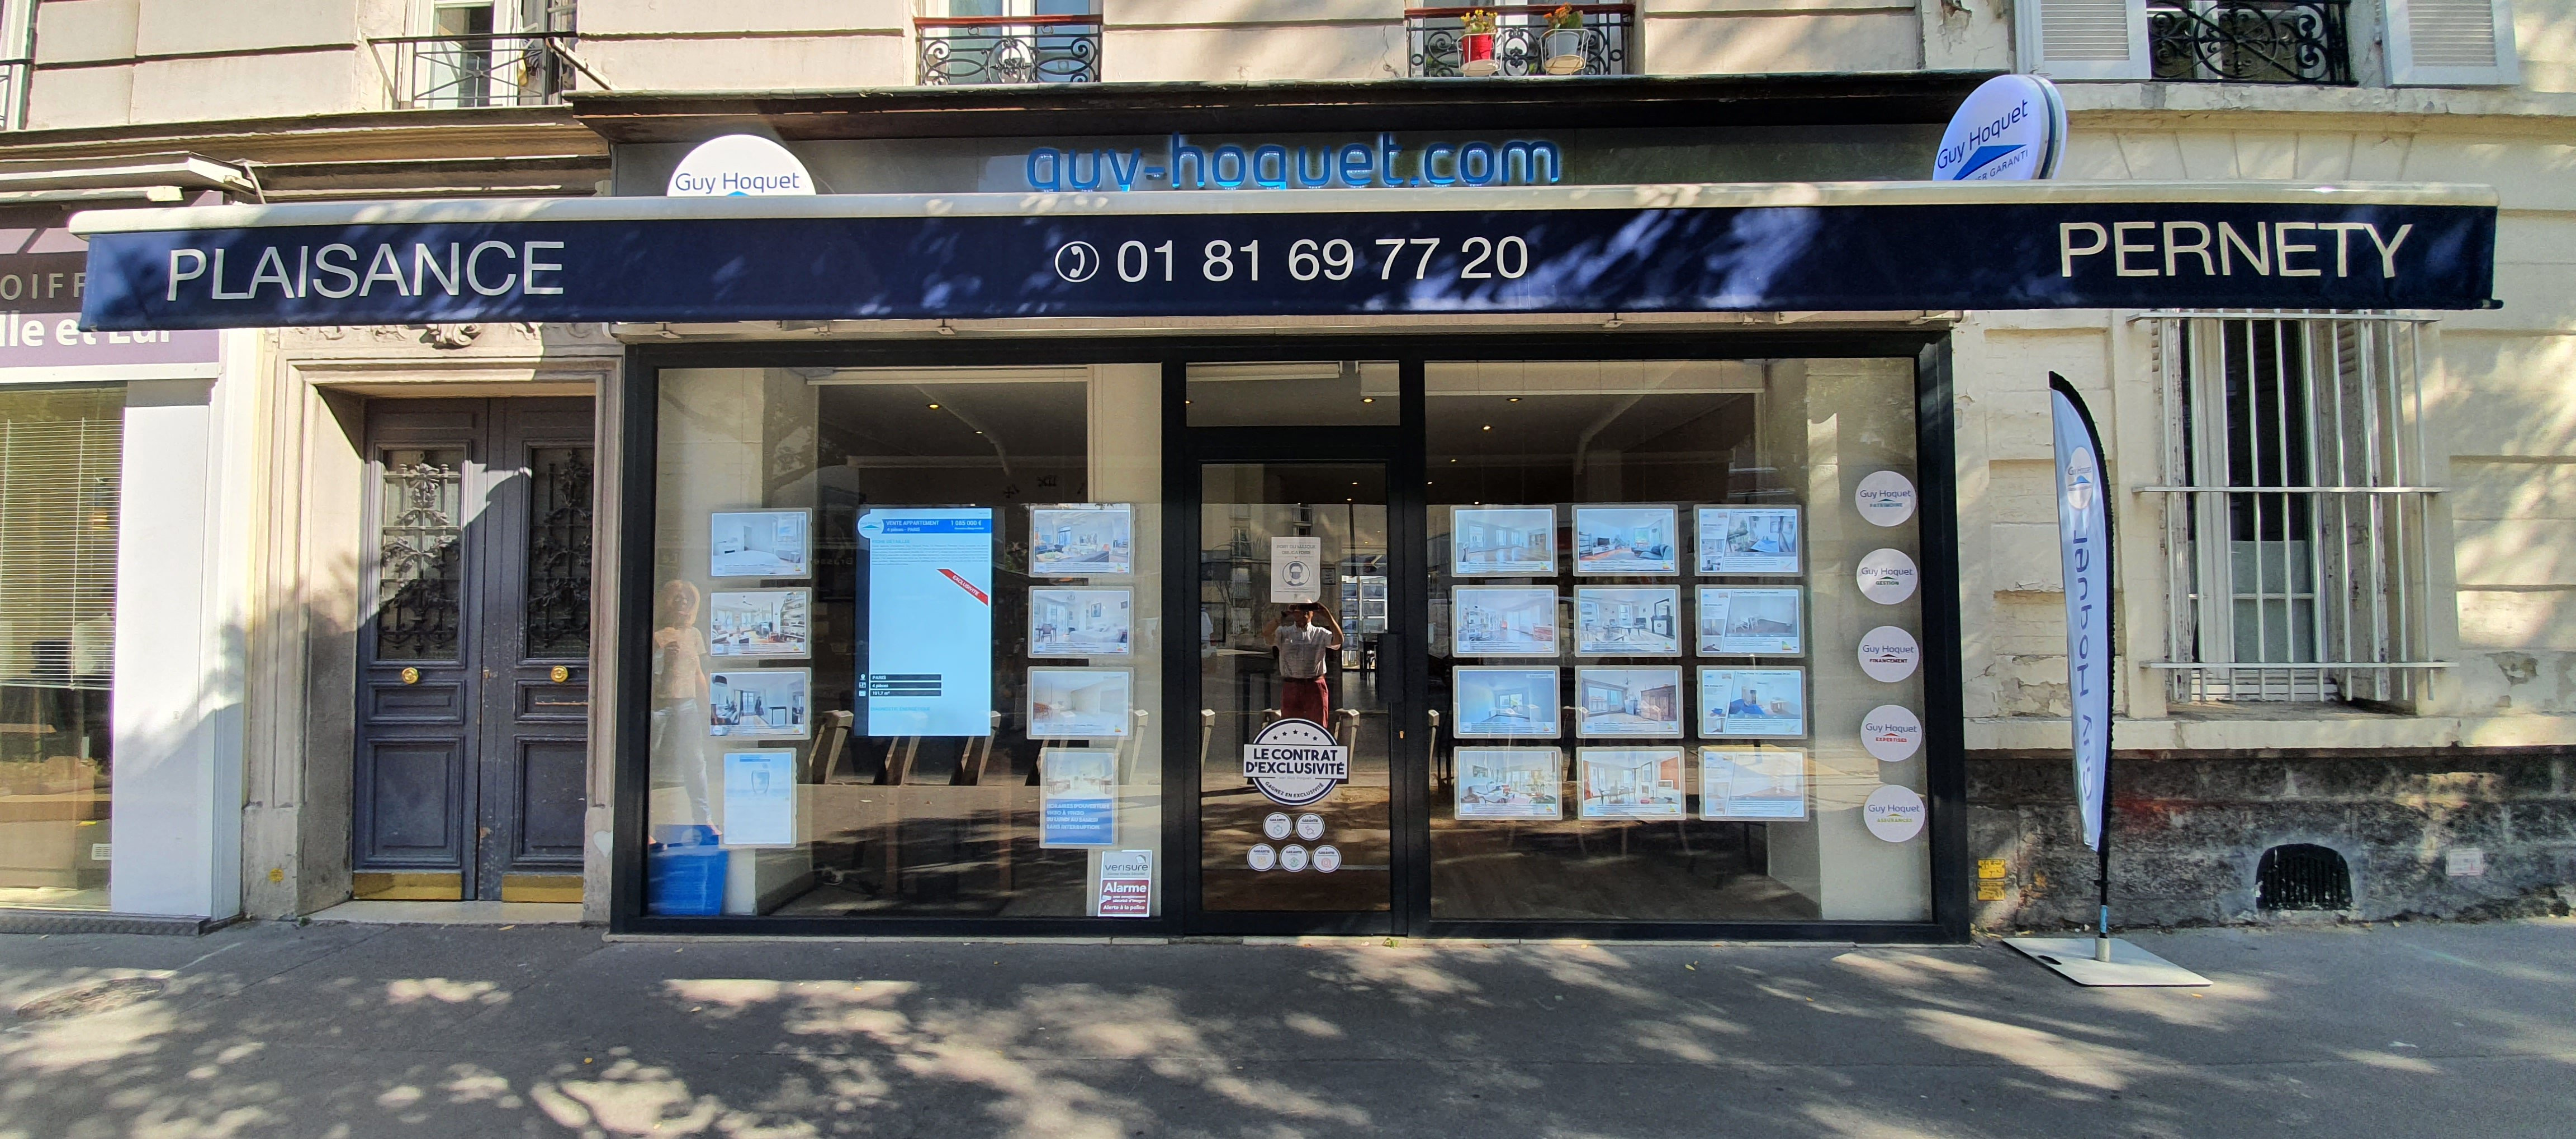 Agence Guy Hoquet PARIS 14 PLAISANCE PERNETY